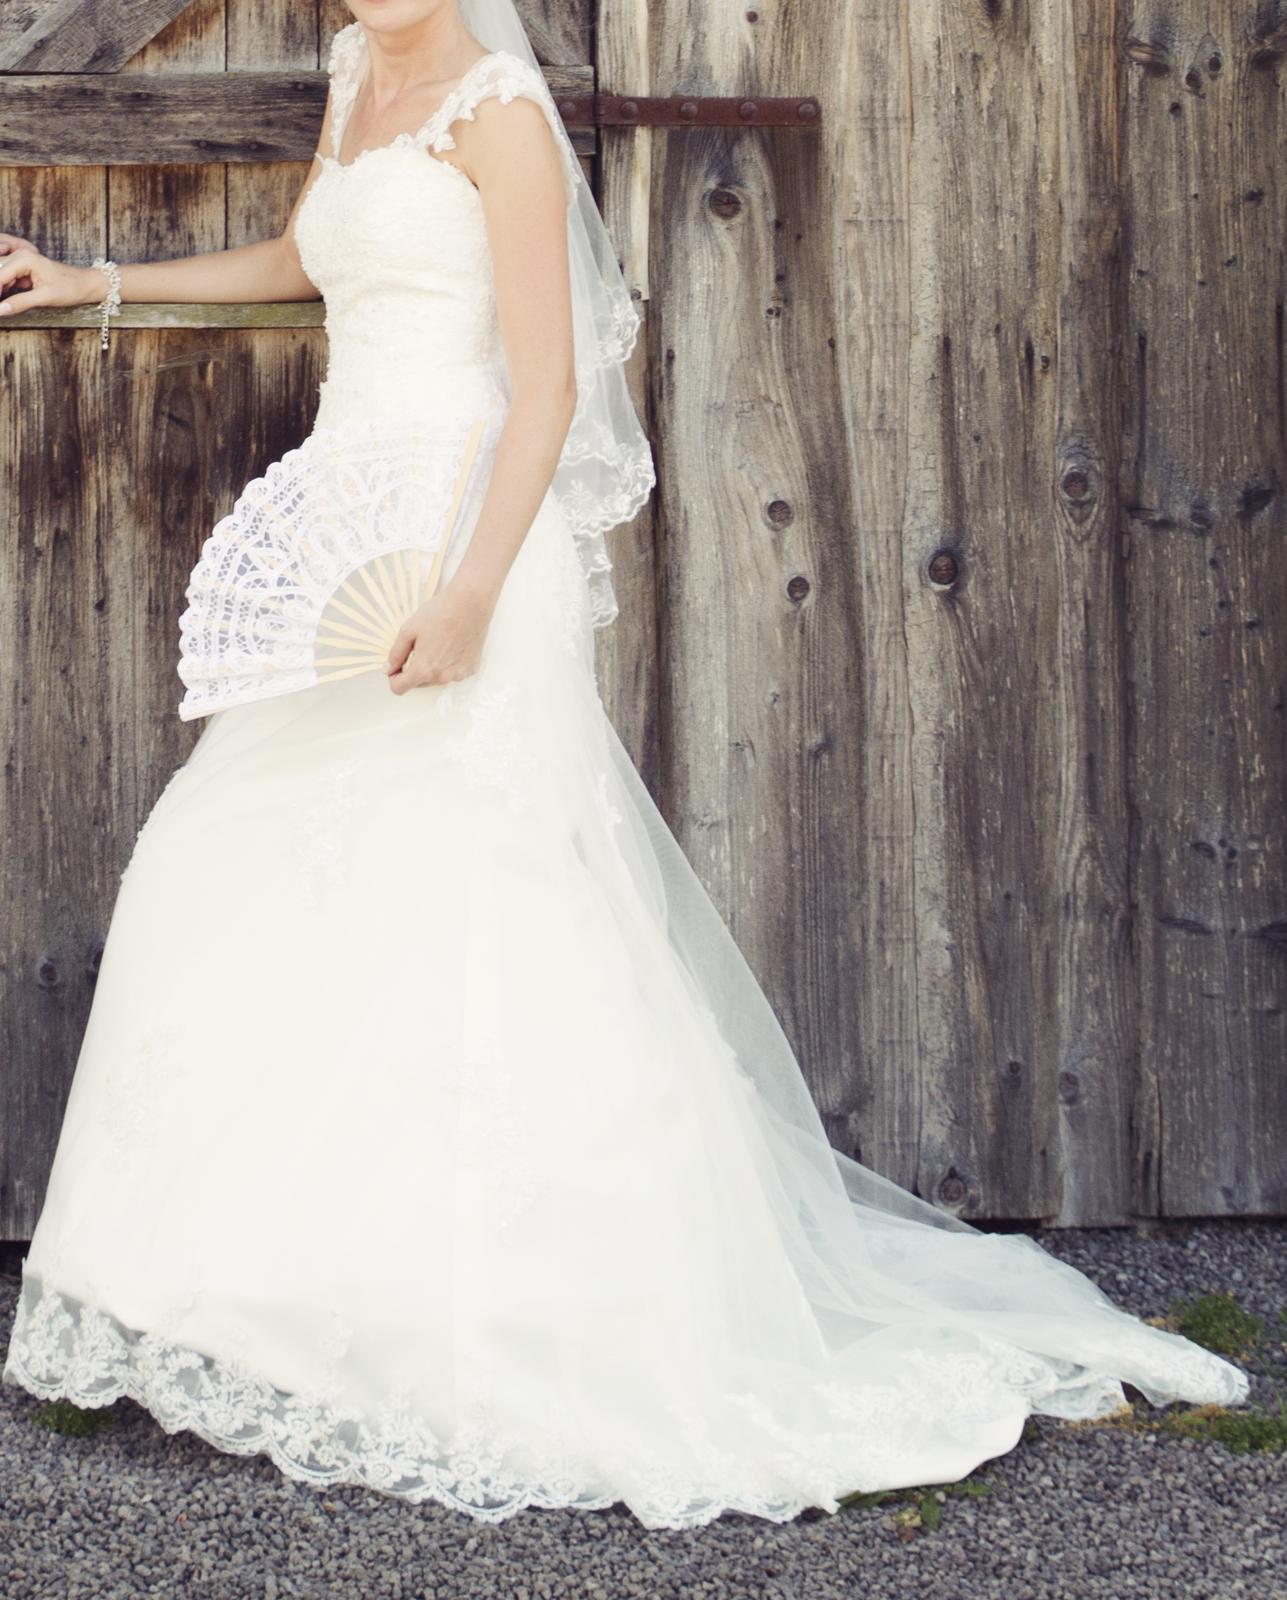 čipkované svadobné šaty s vlečkou - Obrázok č. 1